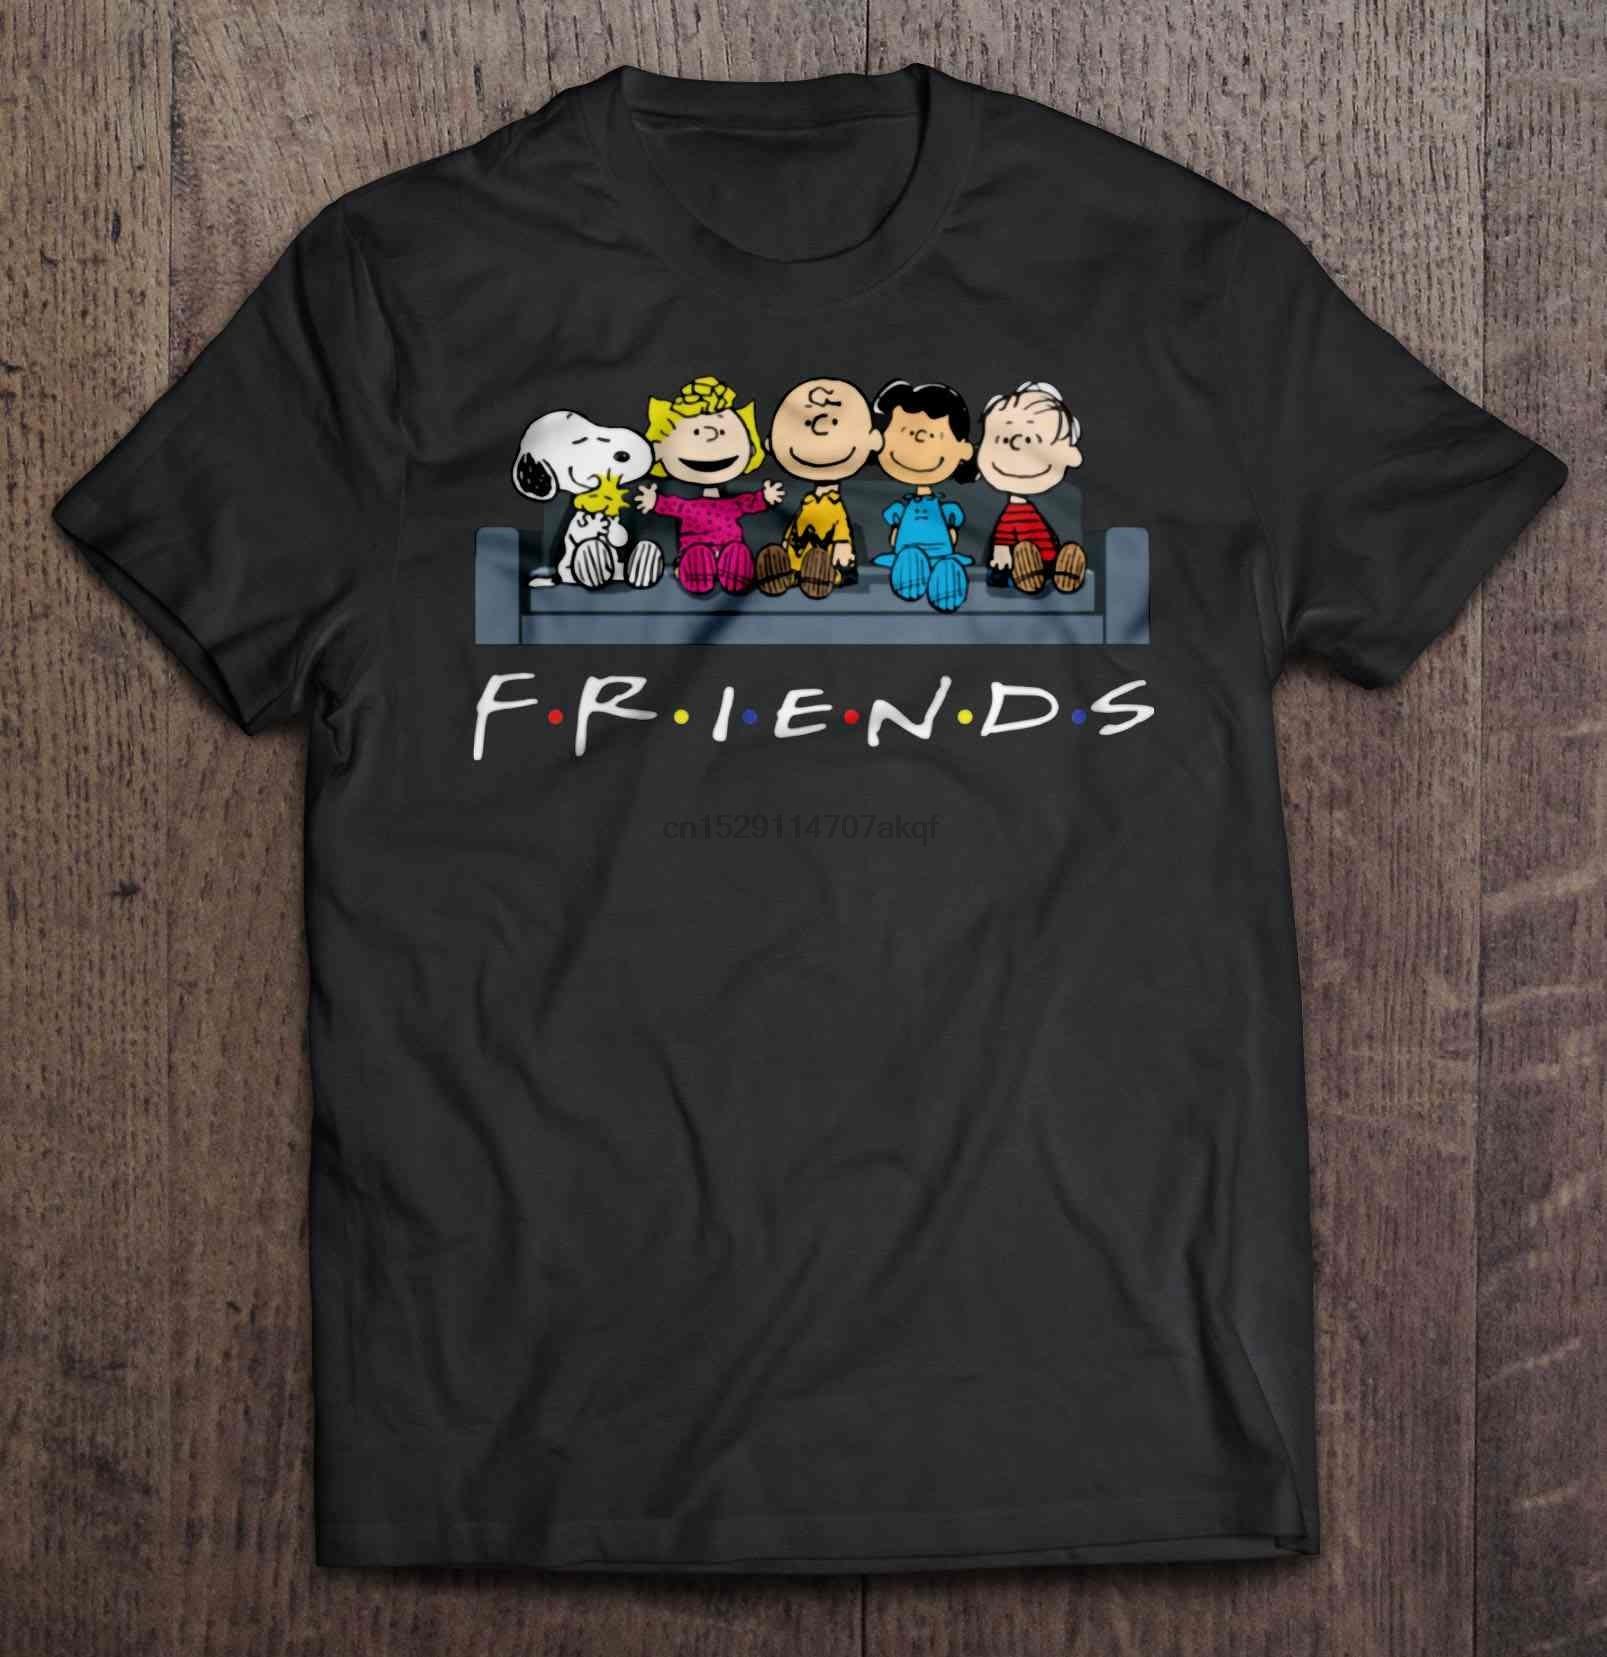 Men Funny T Shirt Fashion tshirt The Peanuts Movie Friends Couch Version Women t-shirt